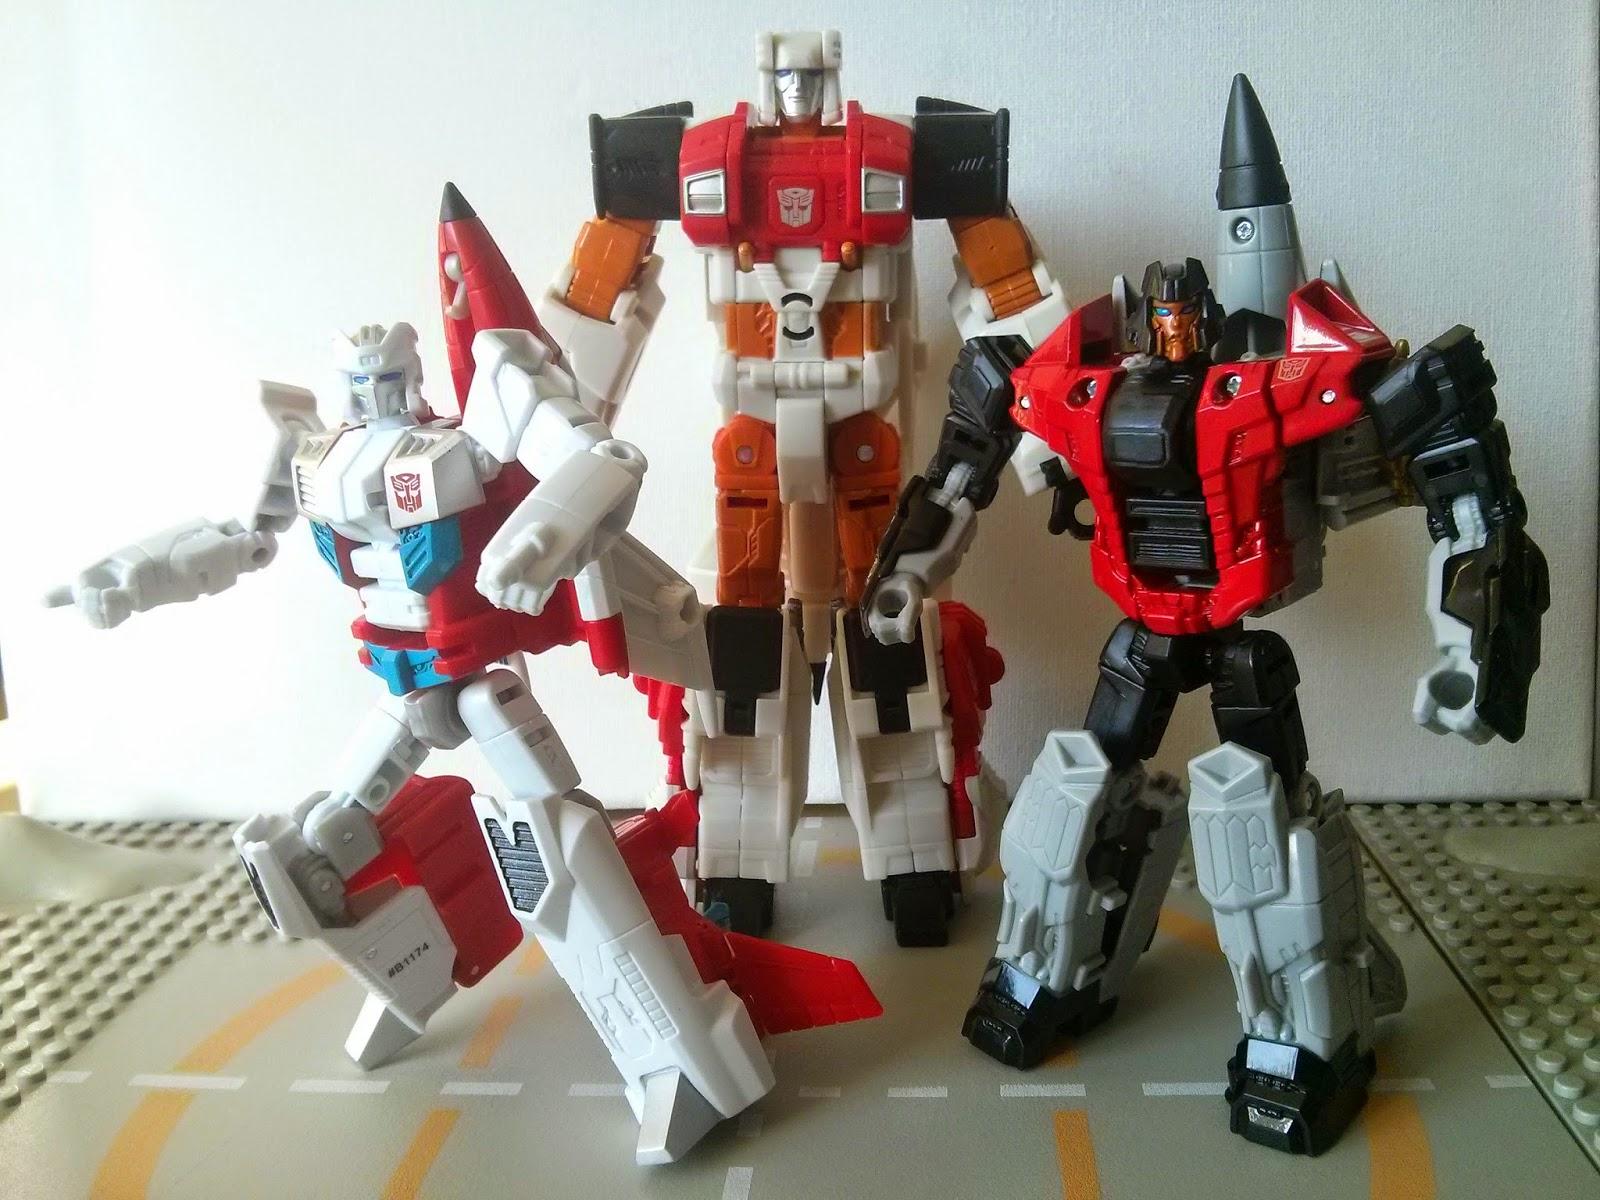 Transformers aerialbots